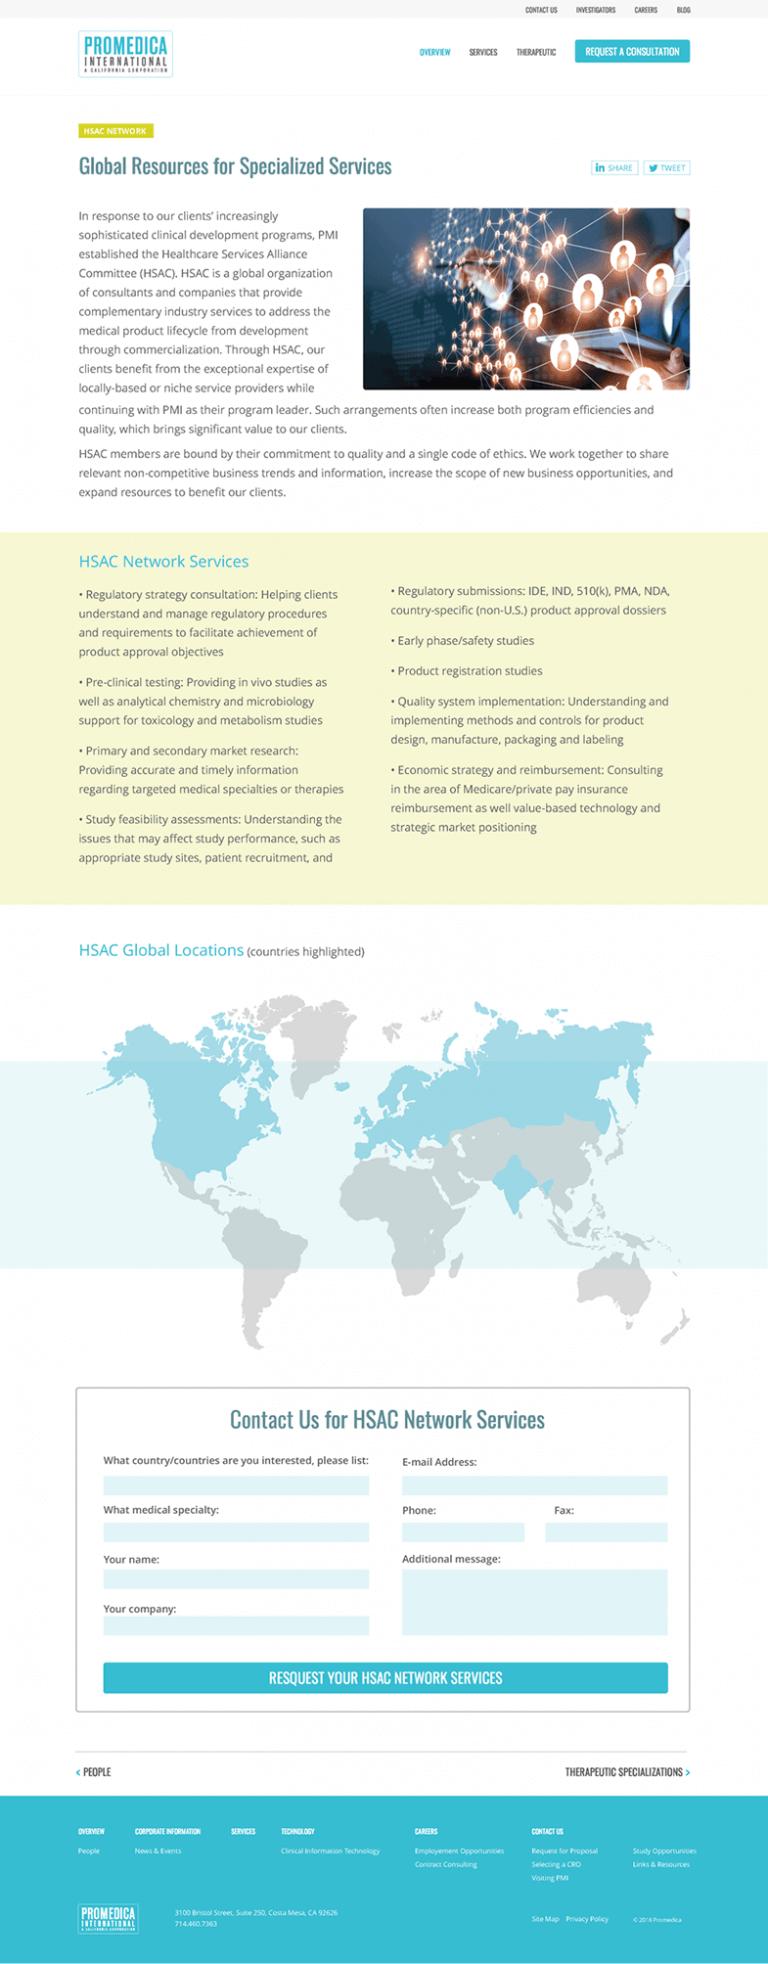 Promedica International Website